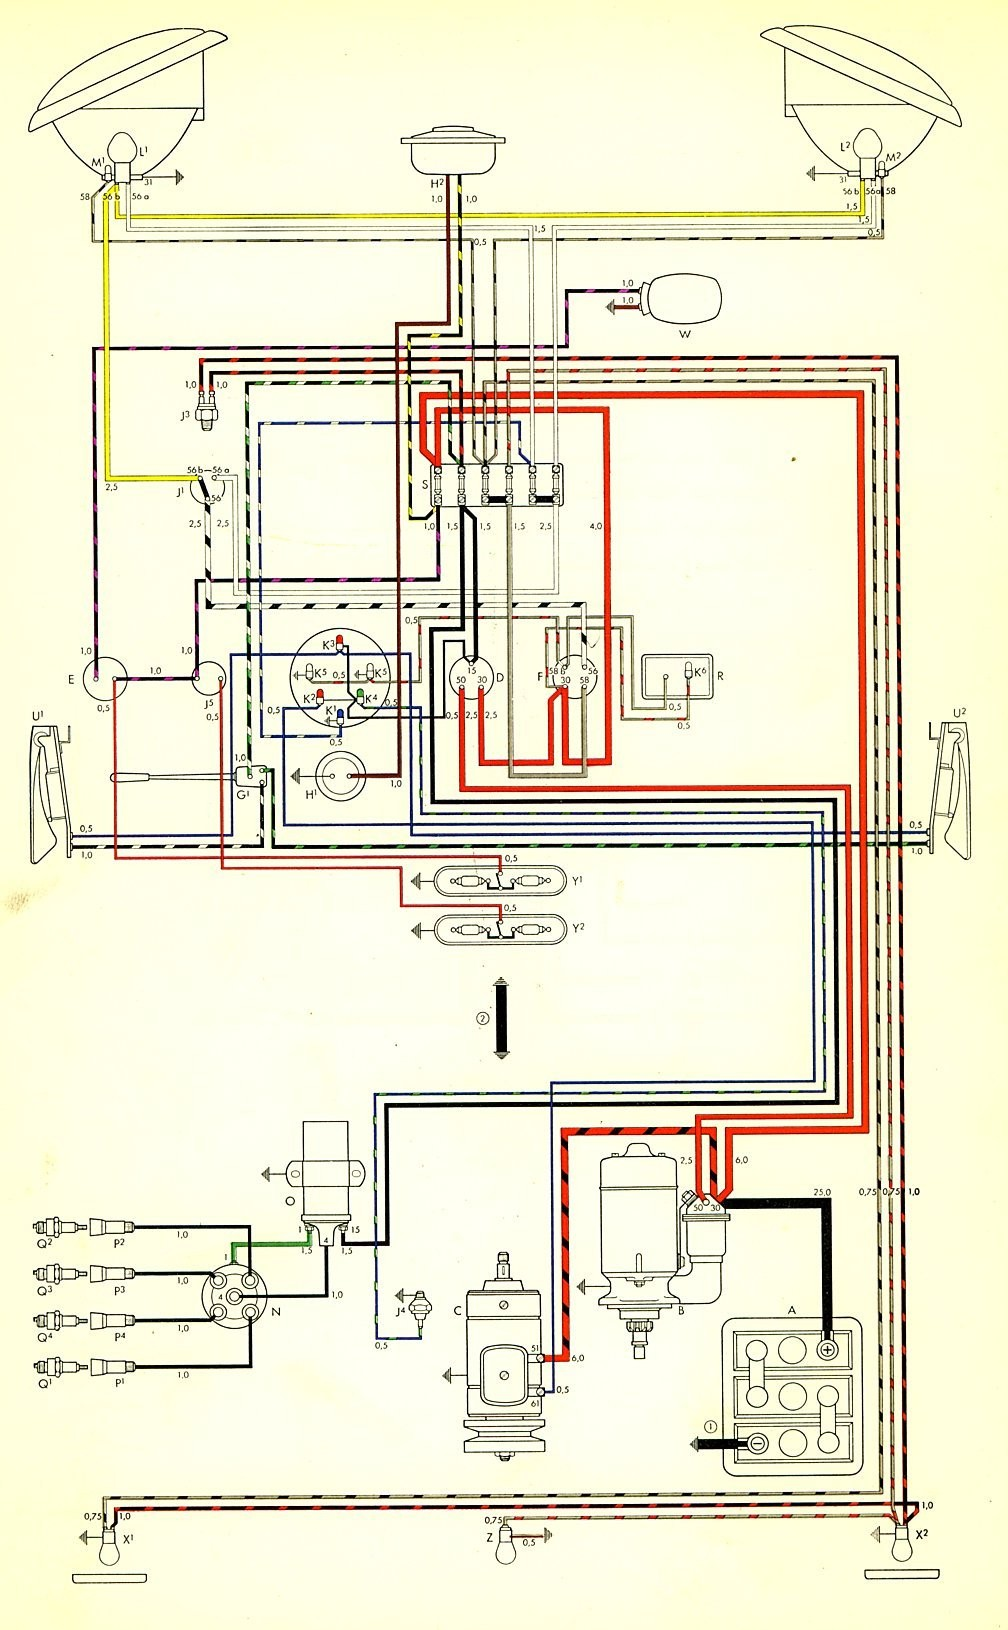 hight resolution of vw alternator wiring diagram best of wiring diagram image 74 vw alternator wiring